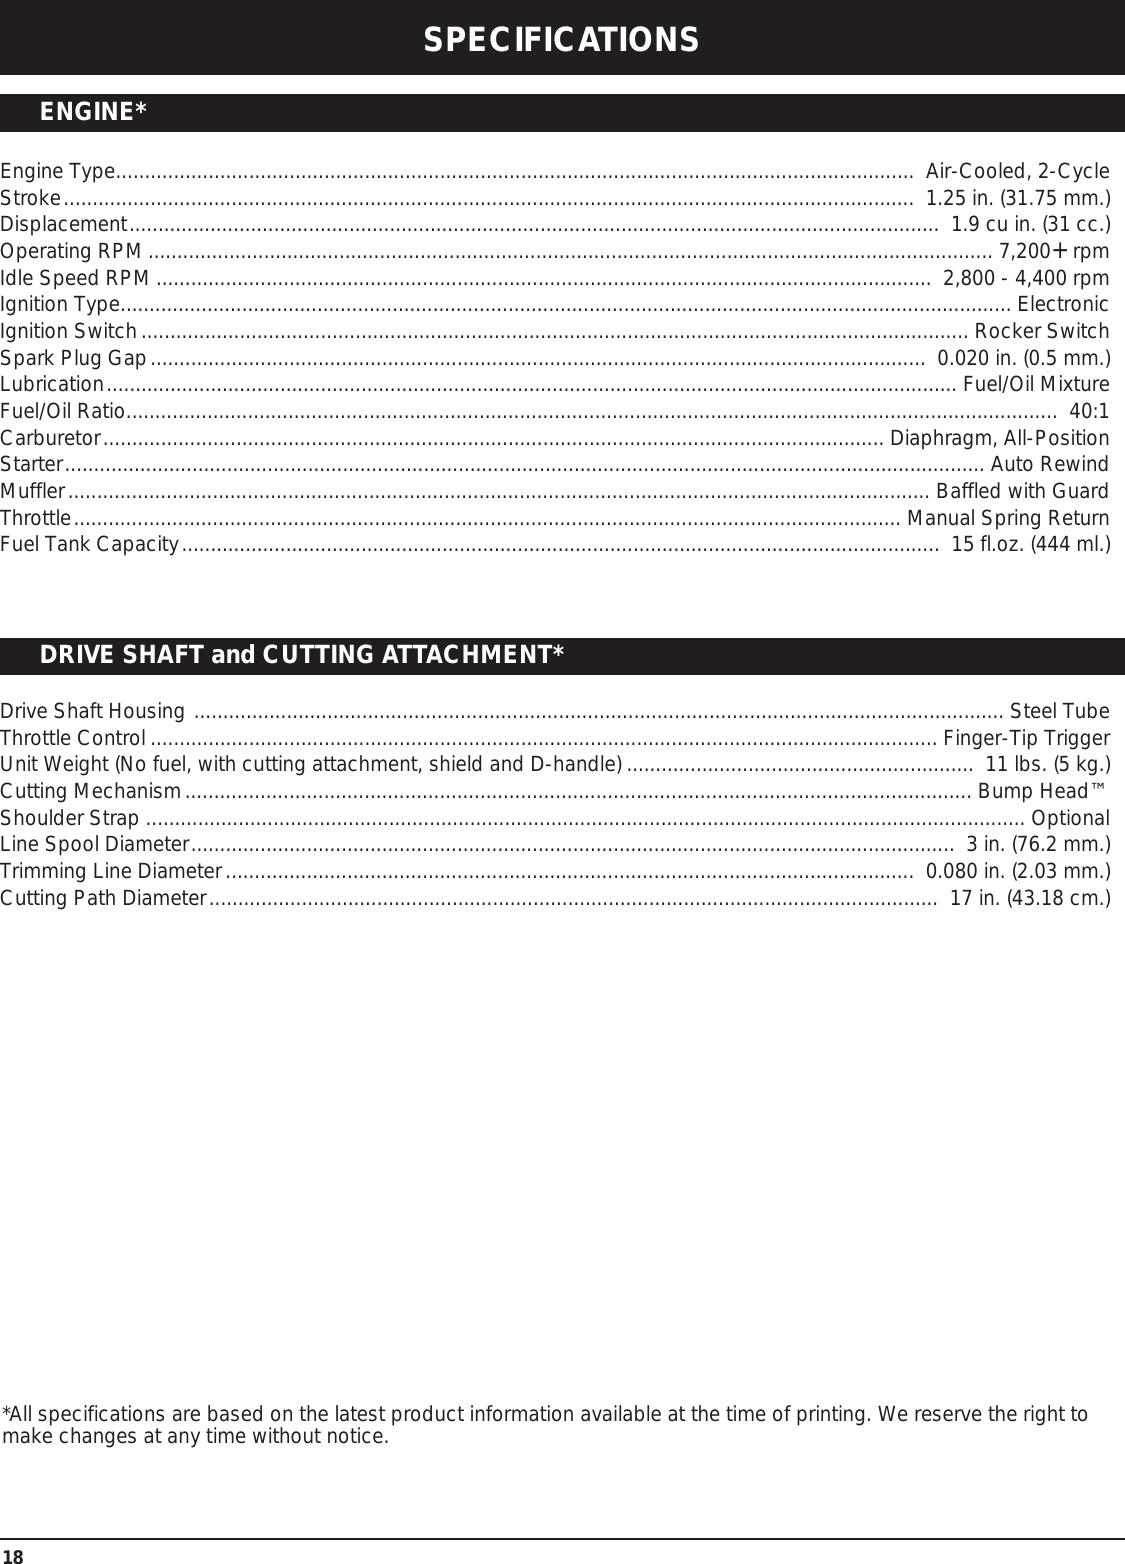 Mtd Mt700 Users Manual 769 01706 Om